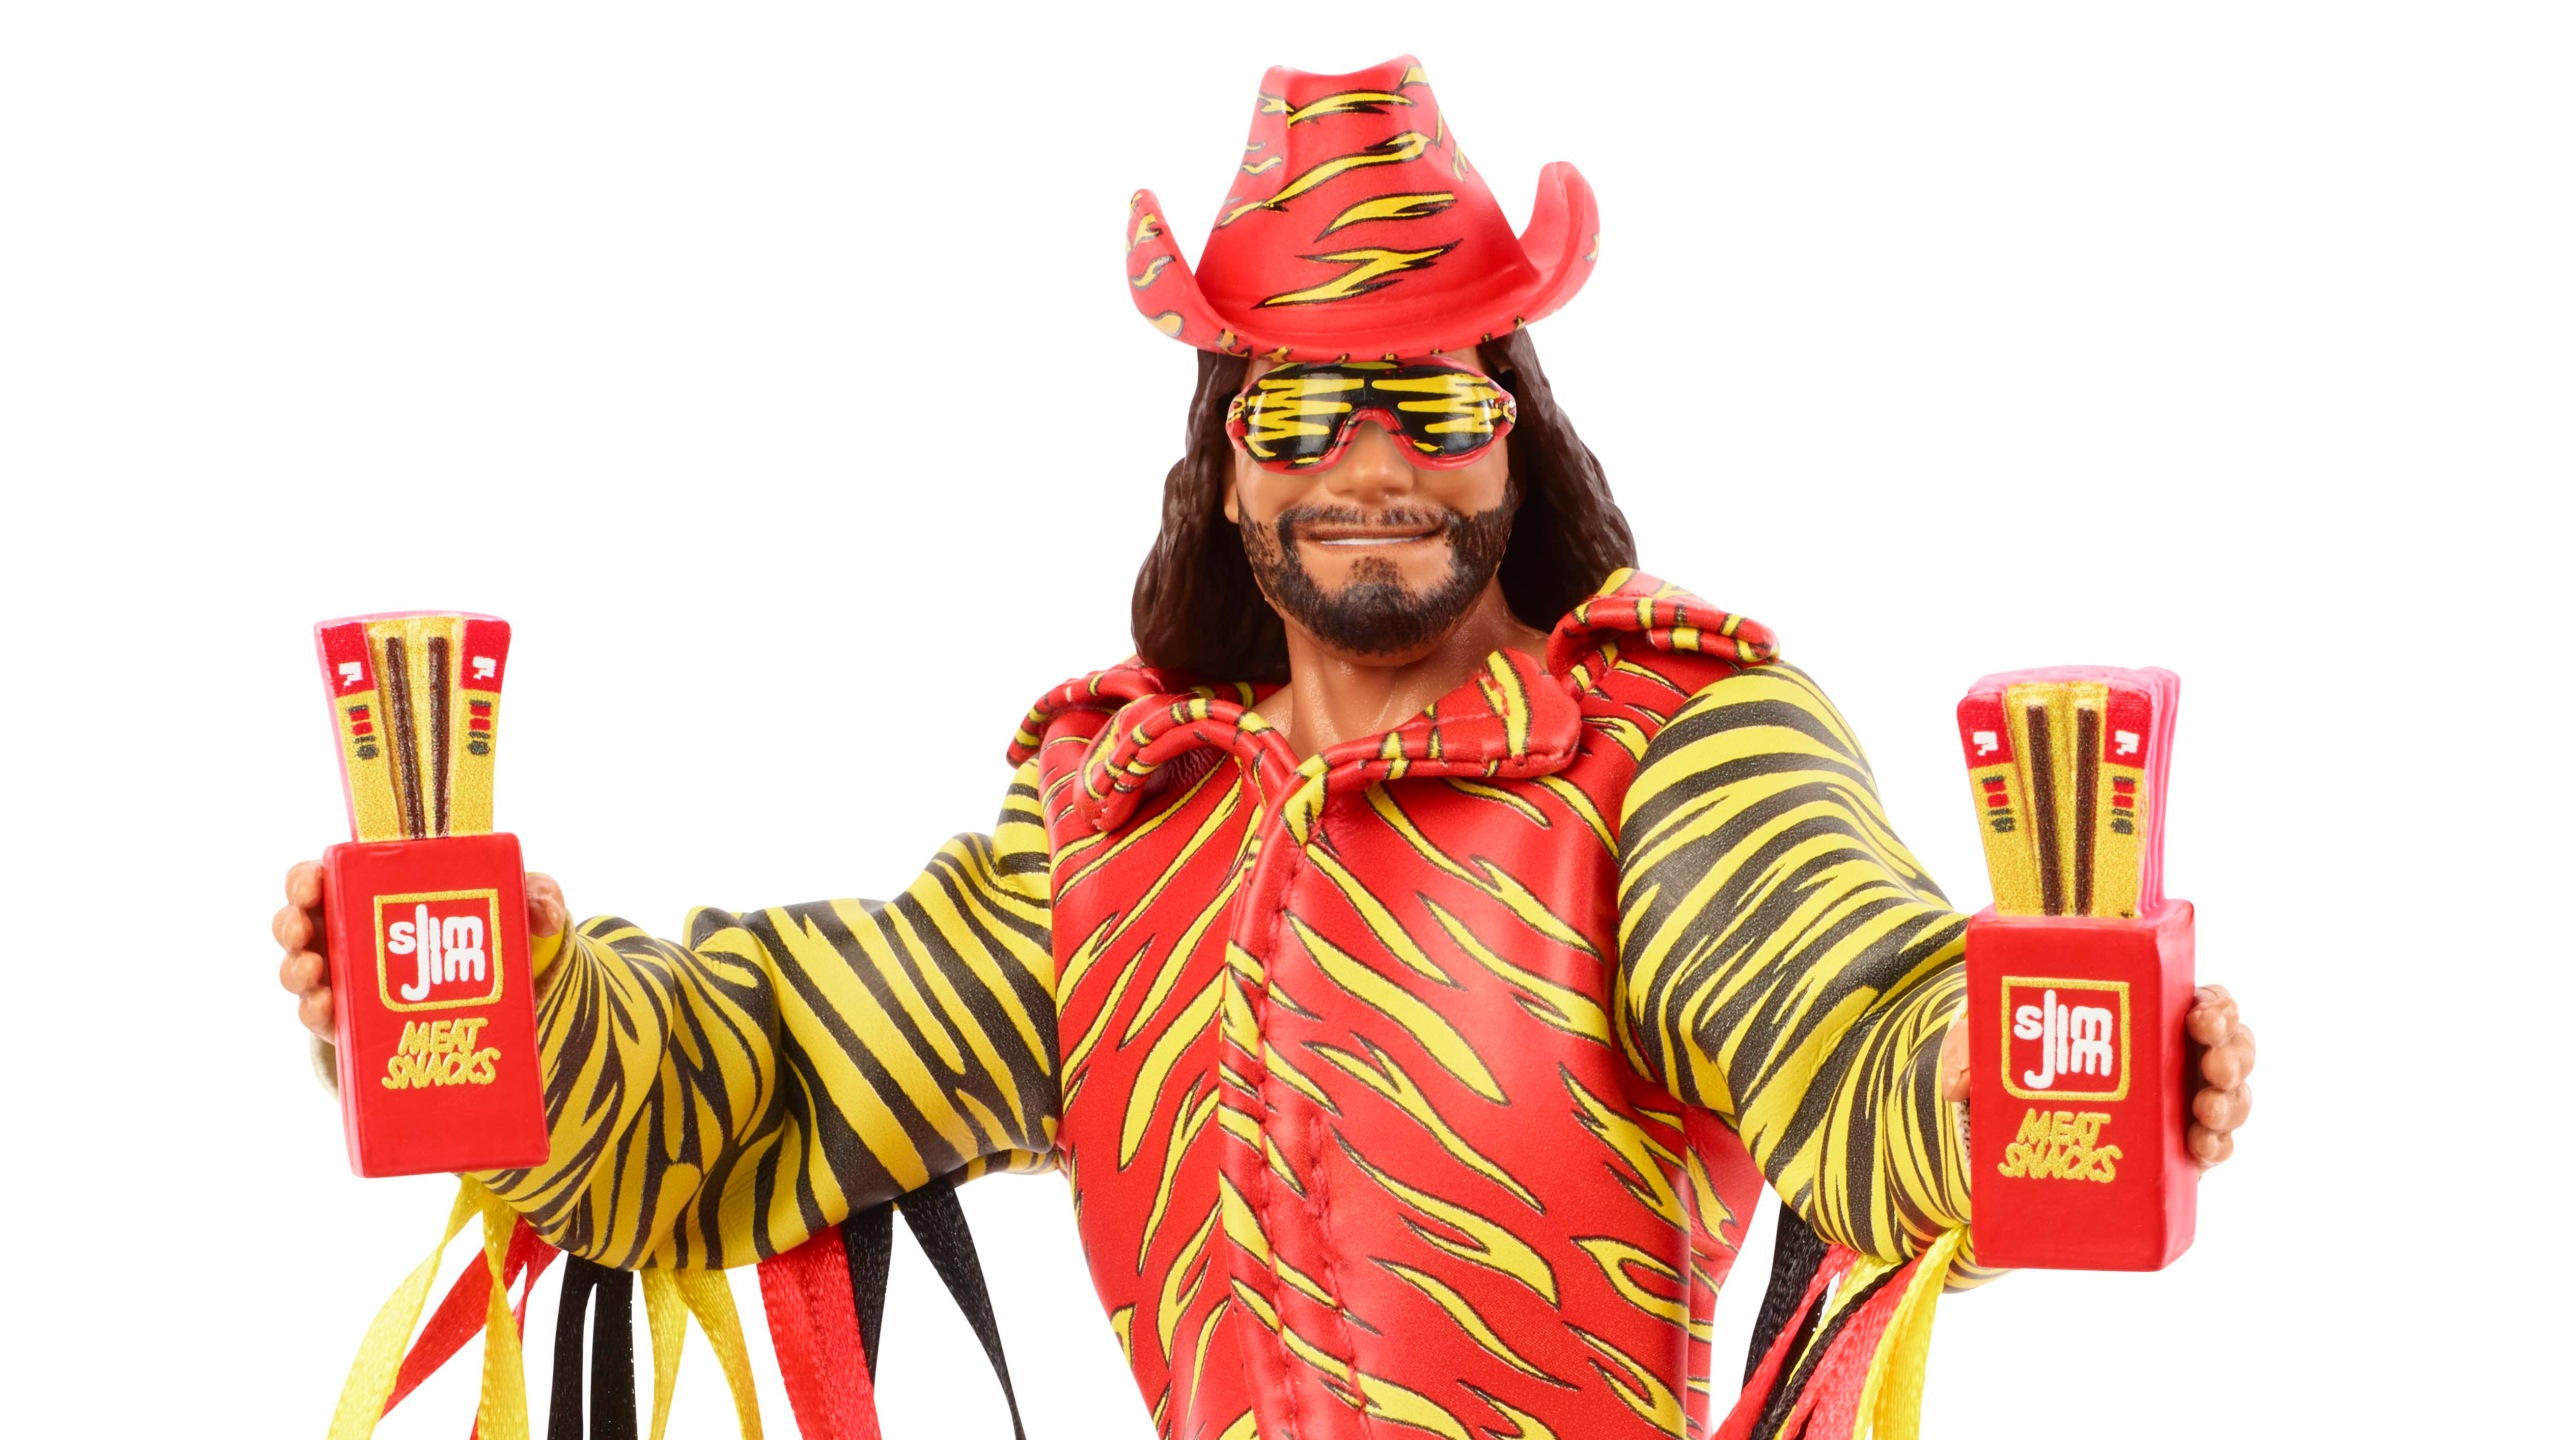 Oh Yeah Mattel Commemorates Macho Man Randy Savage With Slim